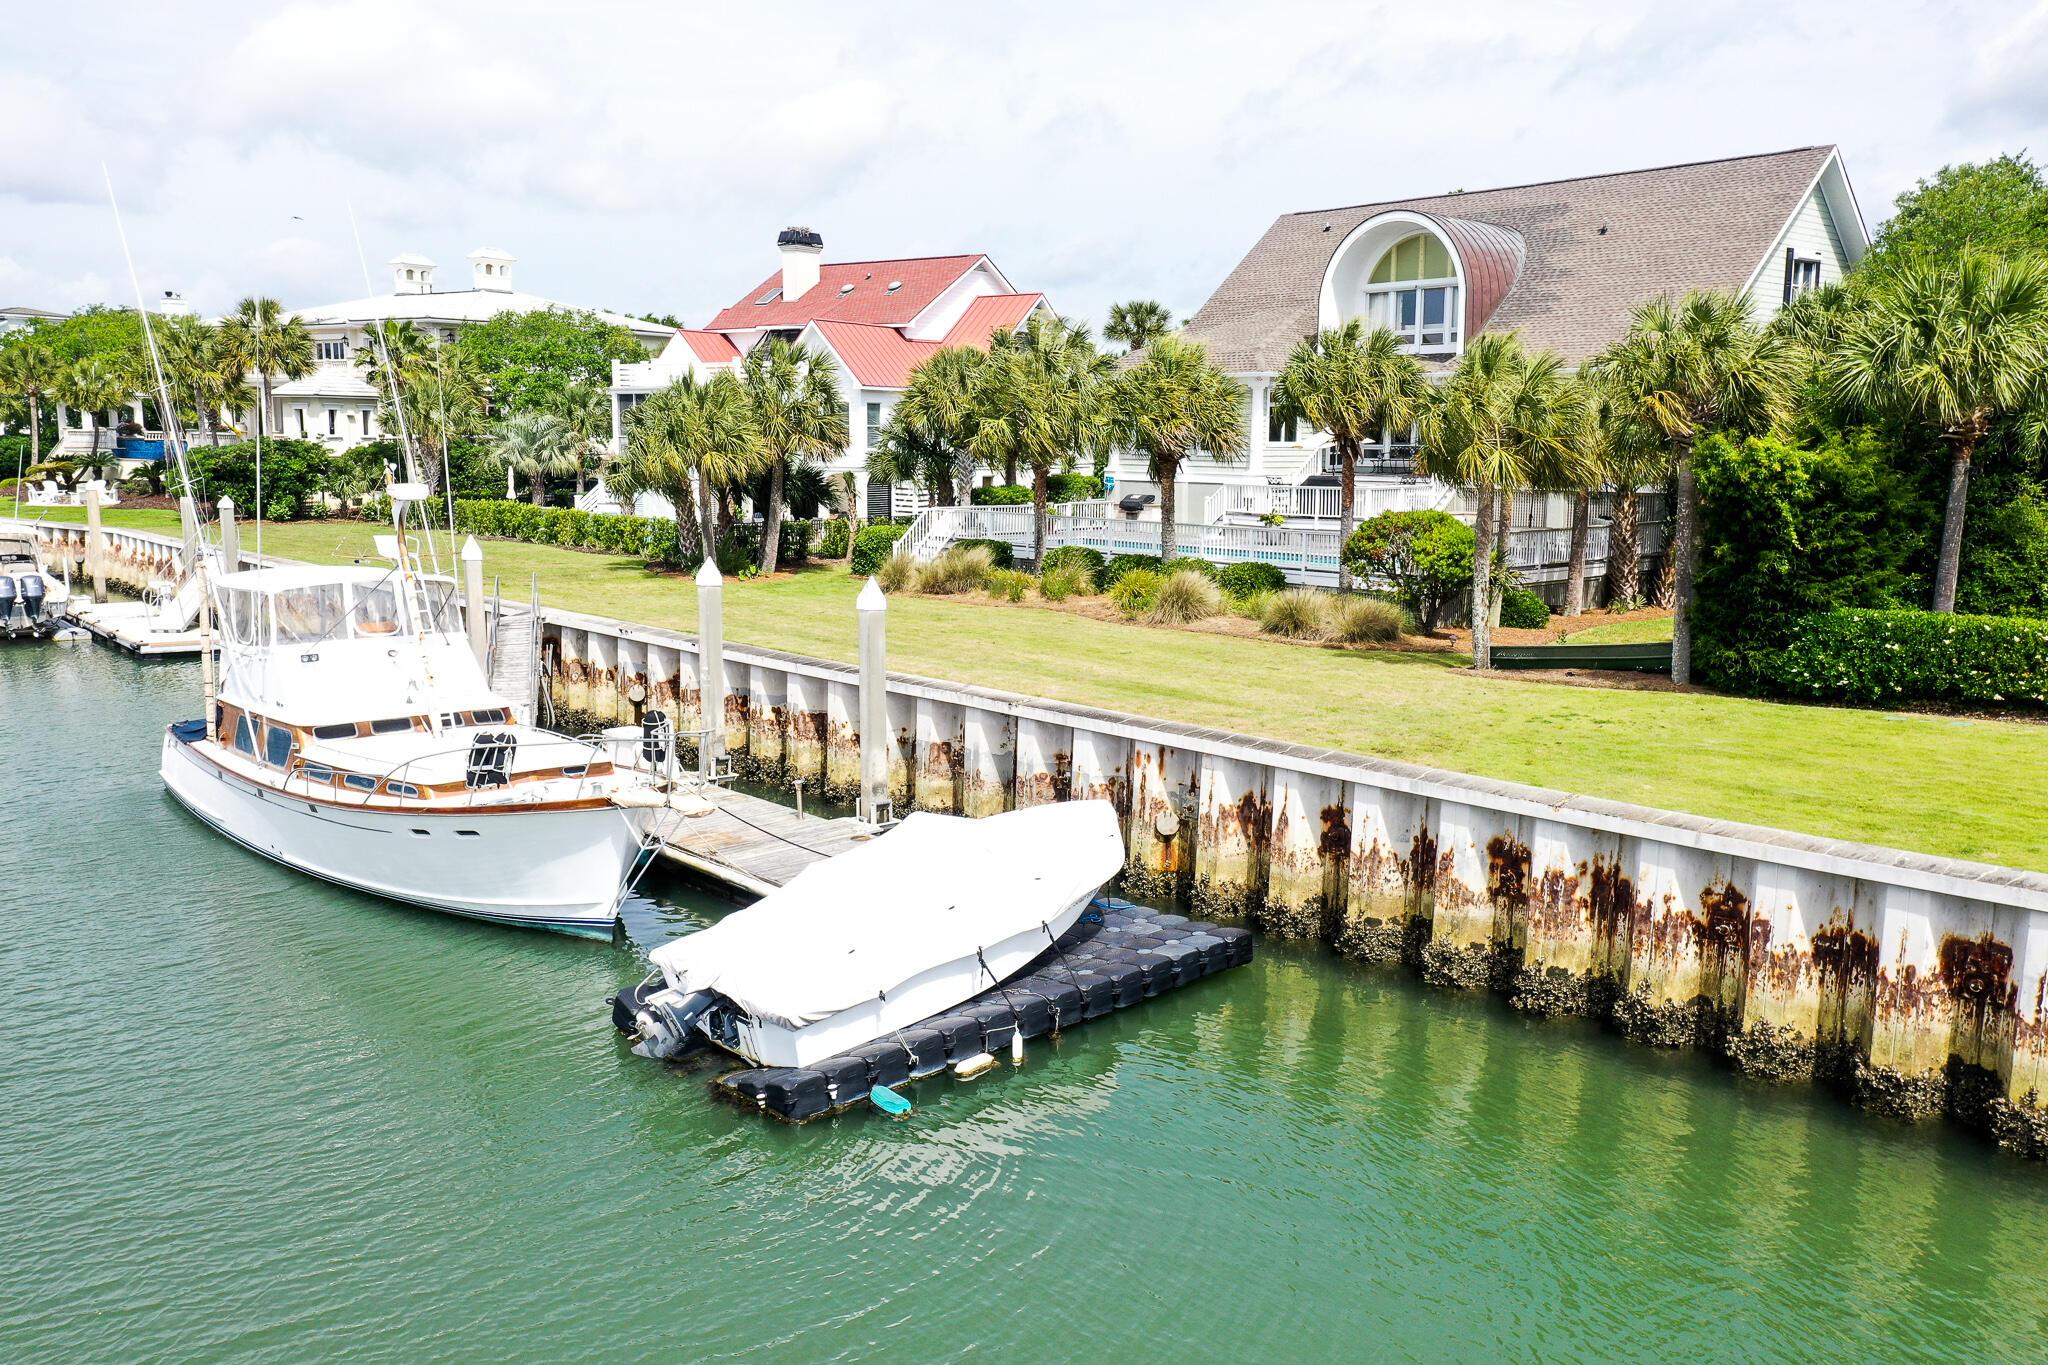 Waterway Island Homes For Sale - 42 Waterway Island Drive, Isle of Palms, SC - 40